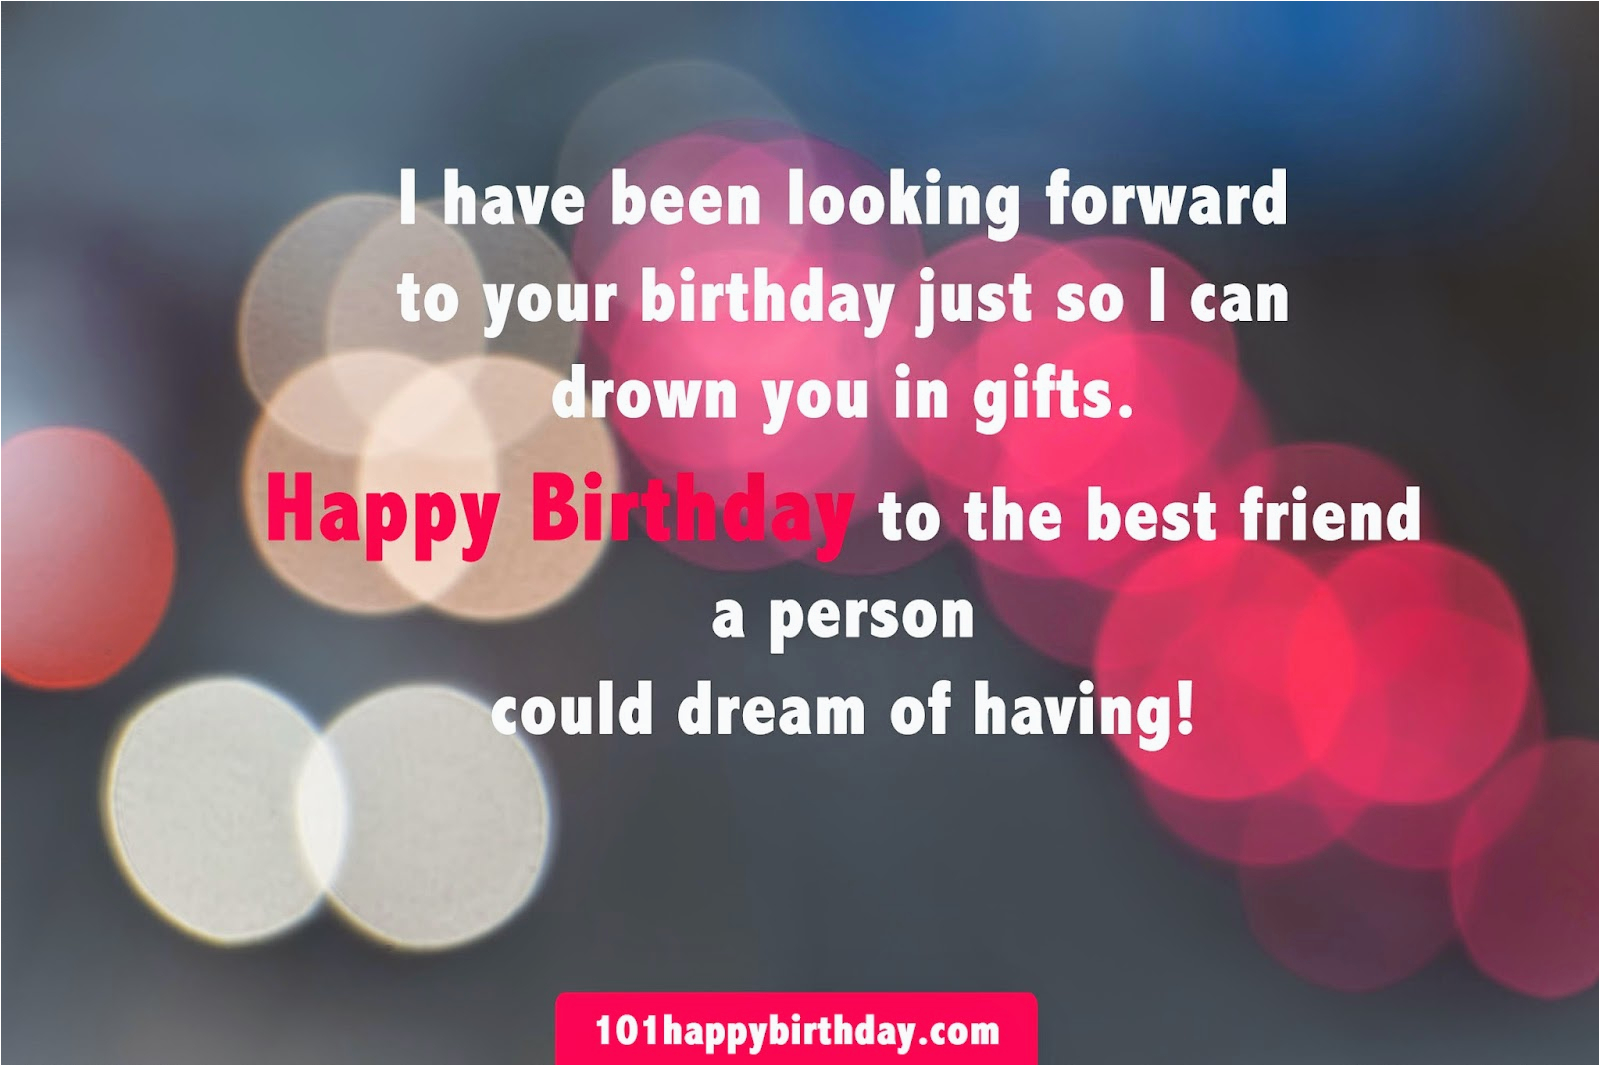 5 best birthday wishes ever